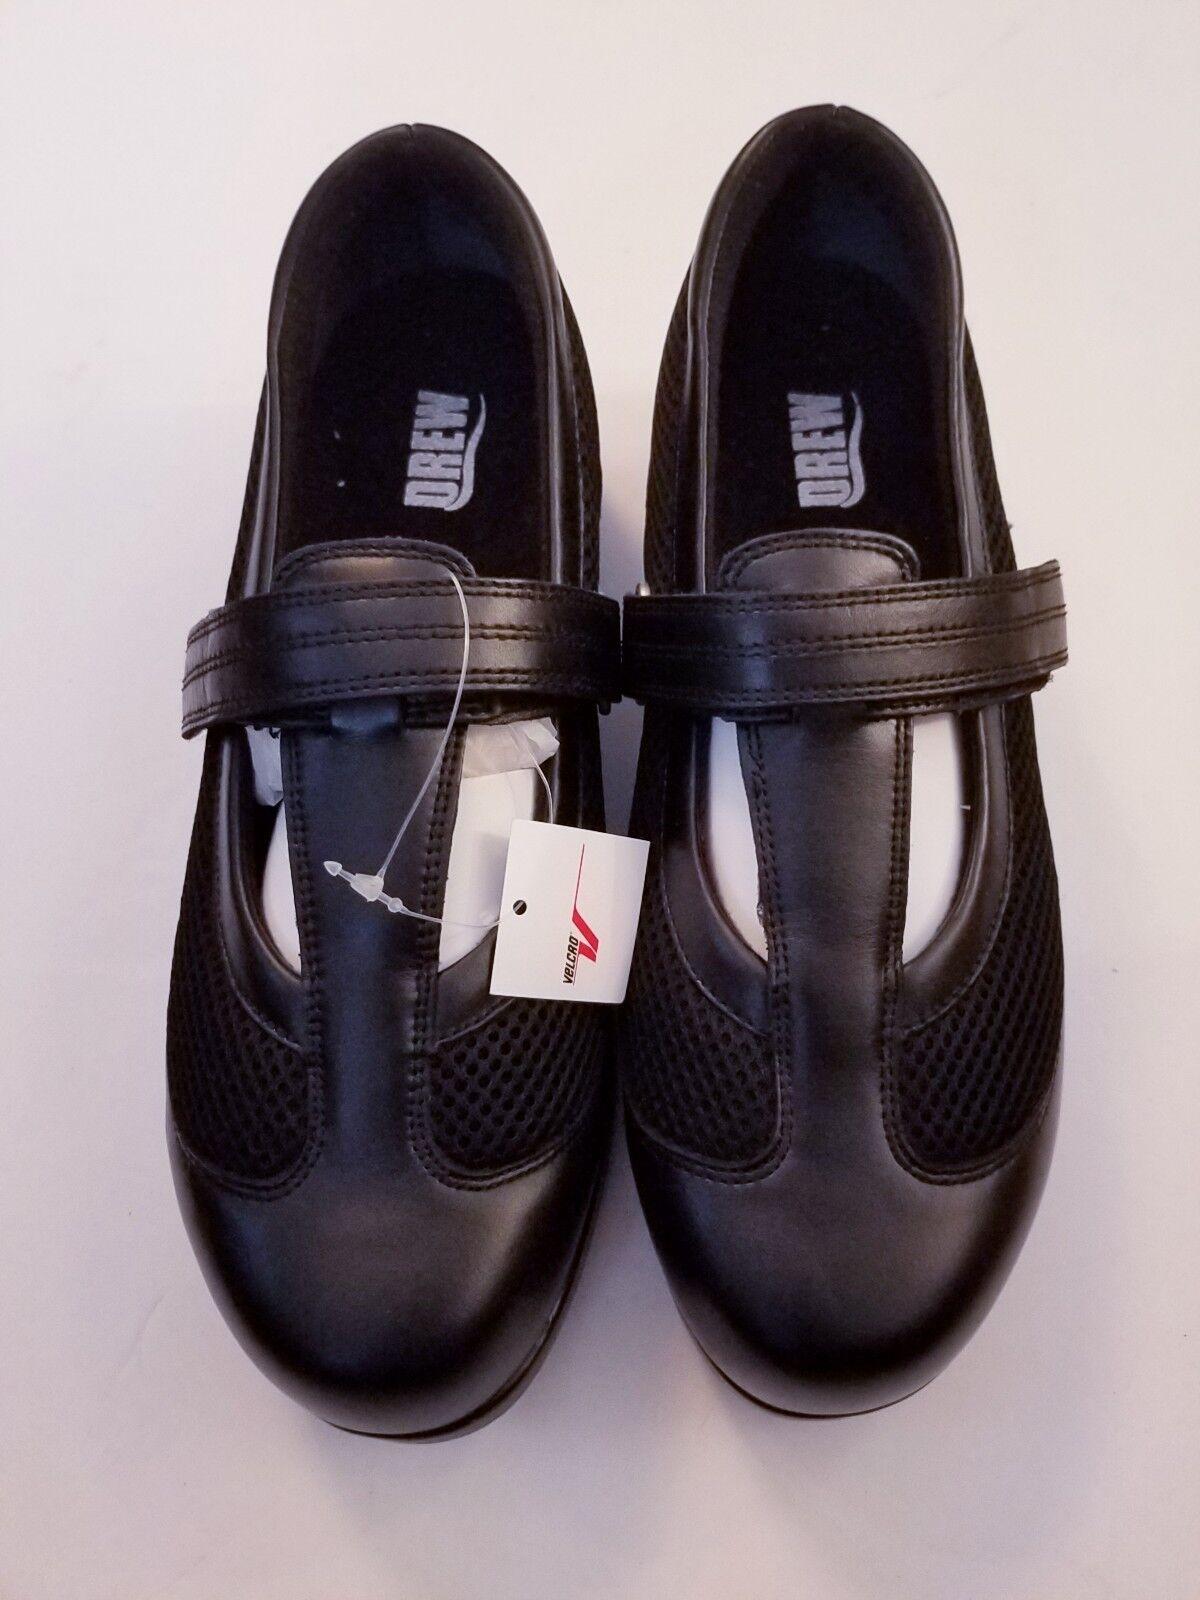 DREW Desiree Black Leather Mary Janes Women's Sz 9 Orthopedic Shoe $155  NEW